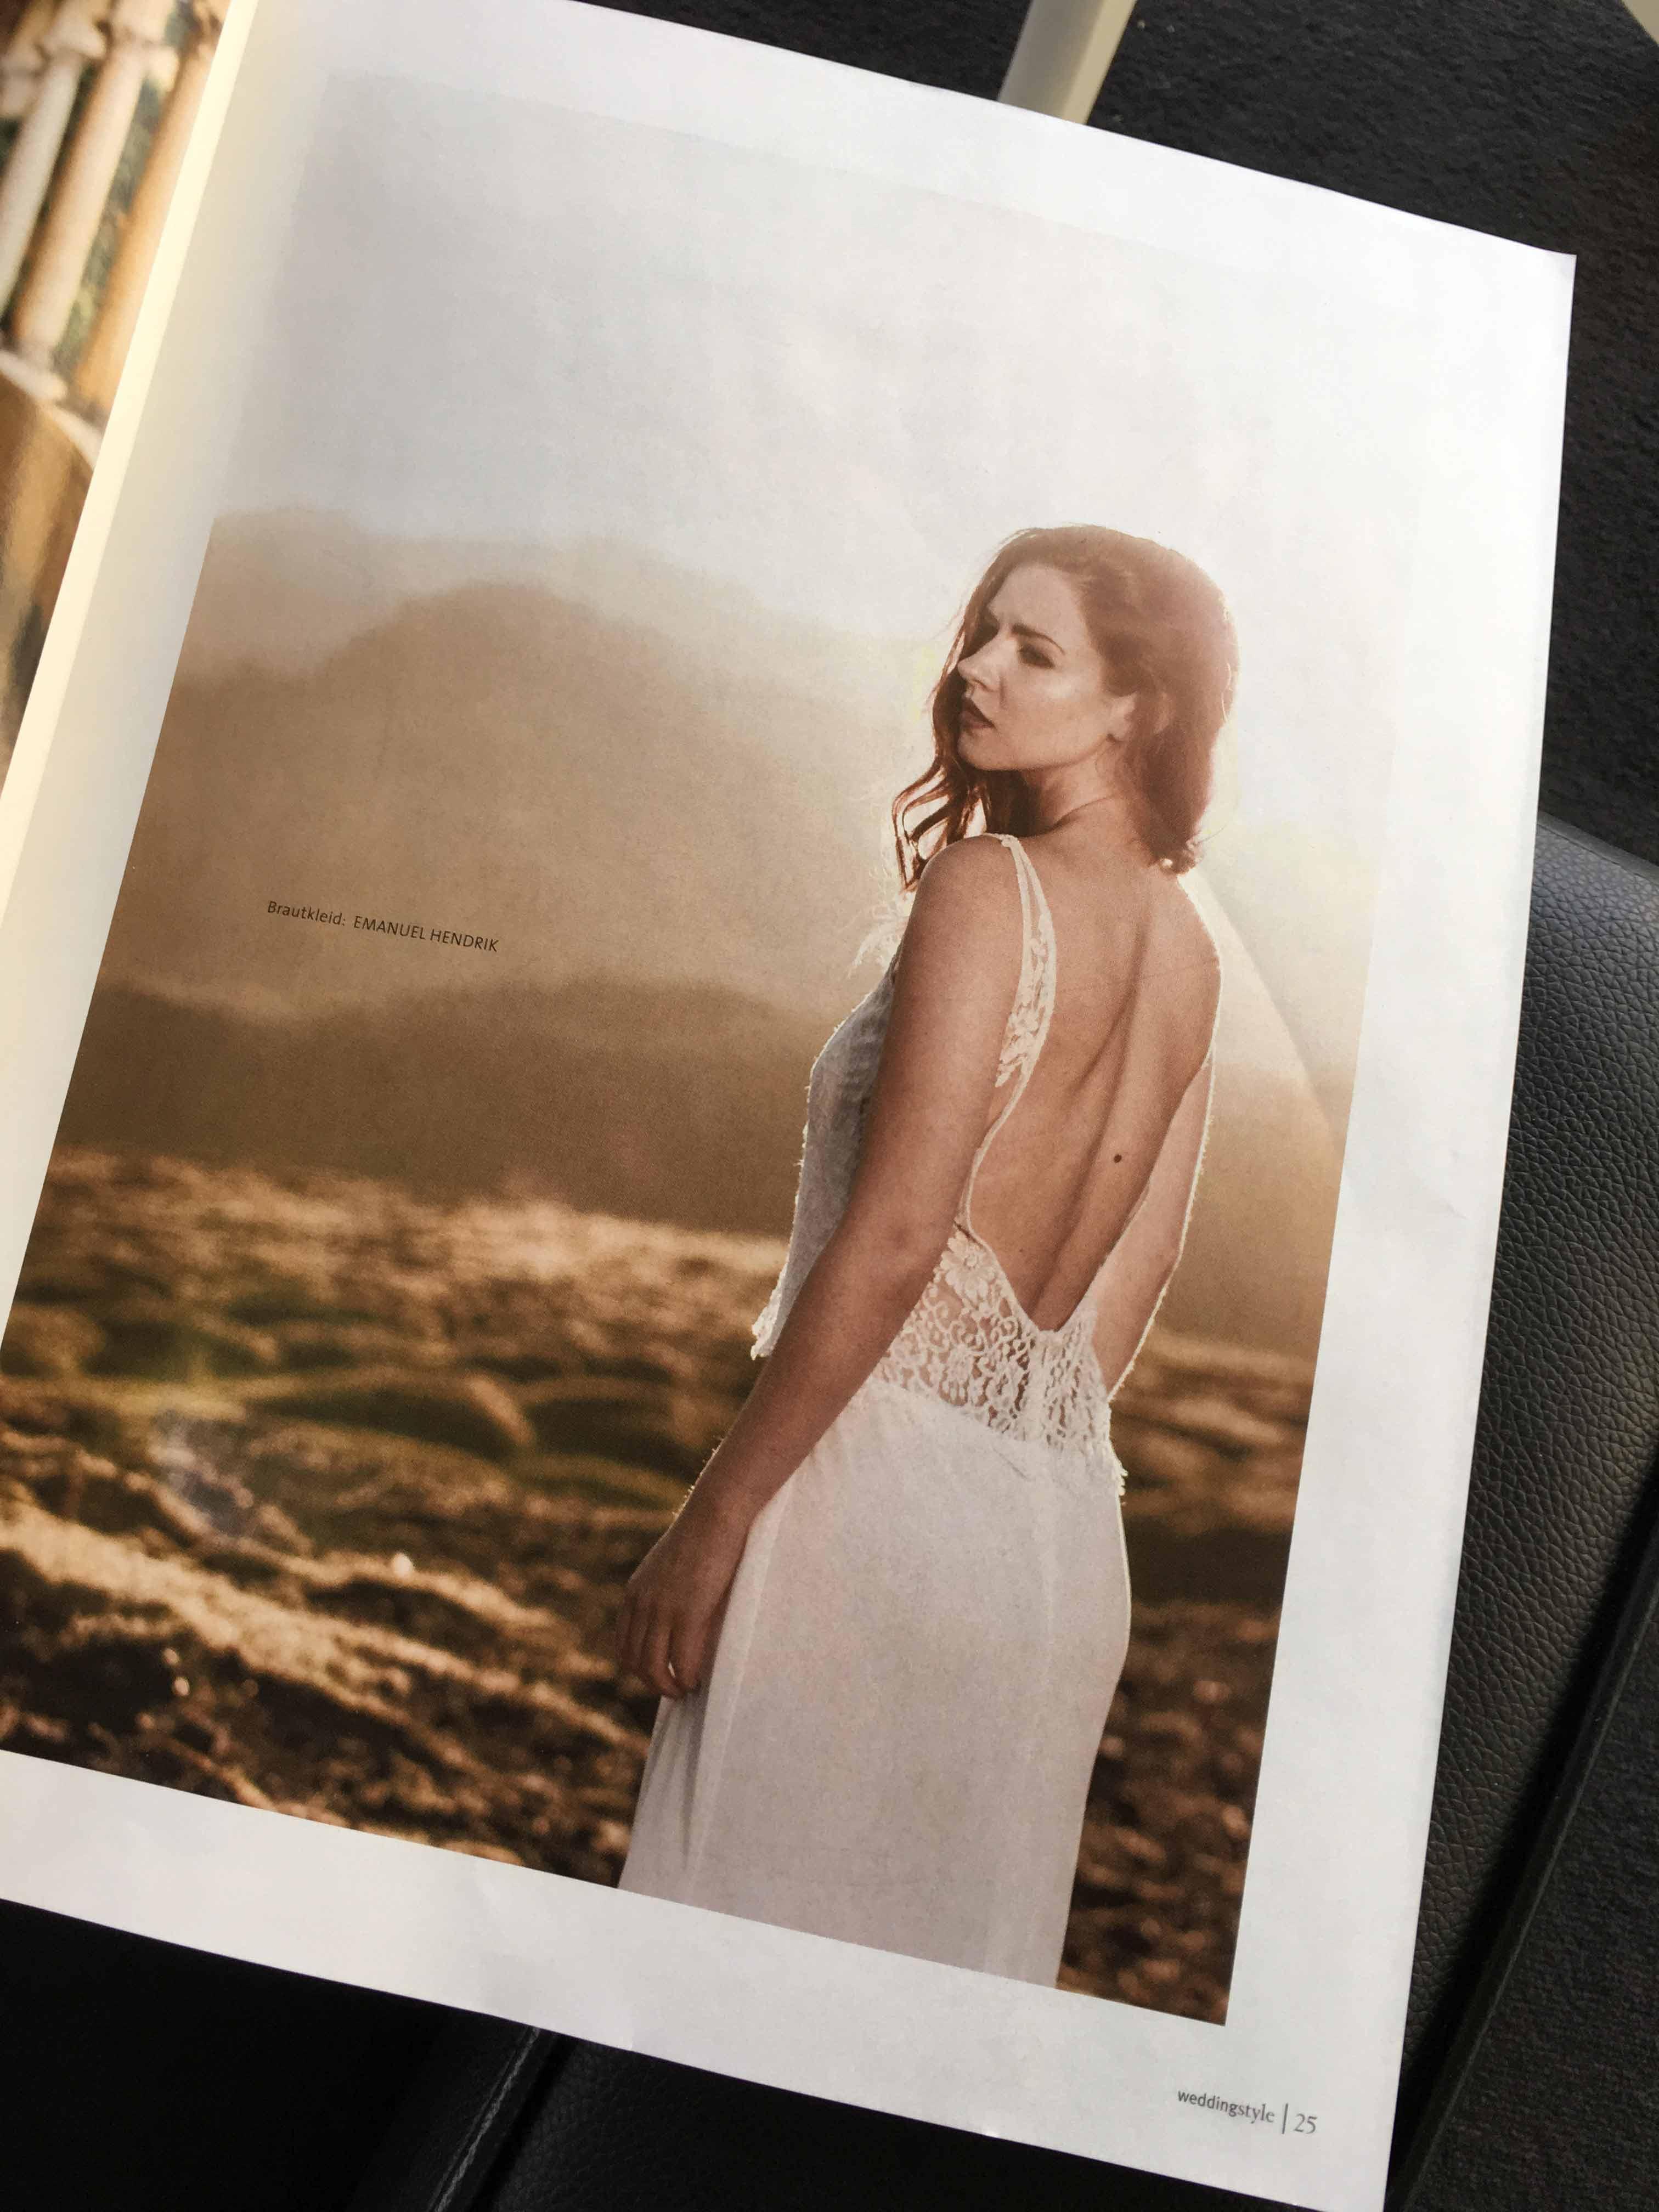 Presse - Wedding Style 2016 - Island - Sina Lindner - Martin Krolop - elegantes Brautkleid Sharon